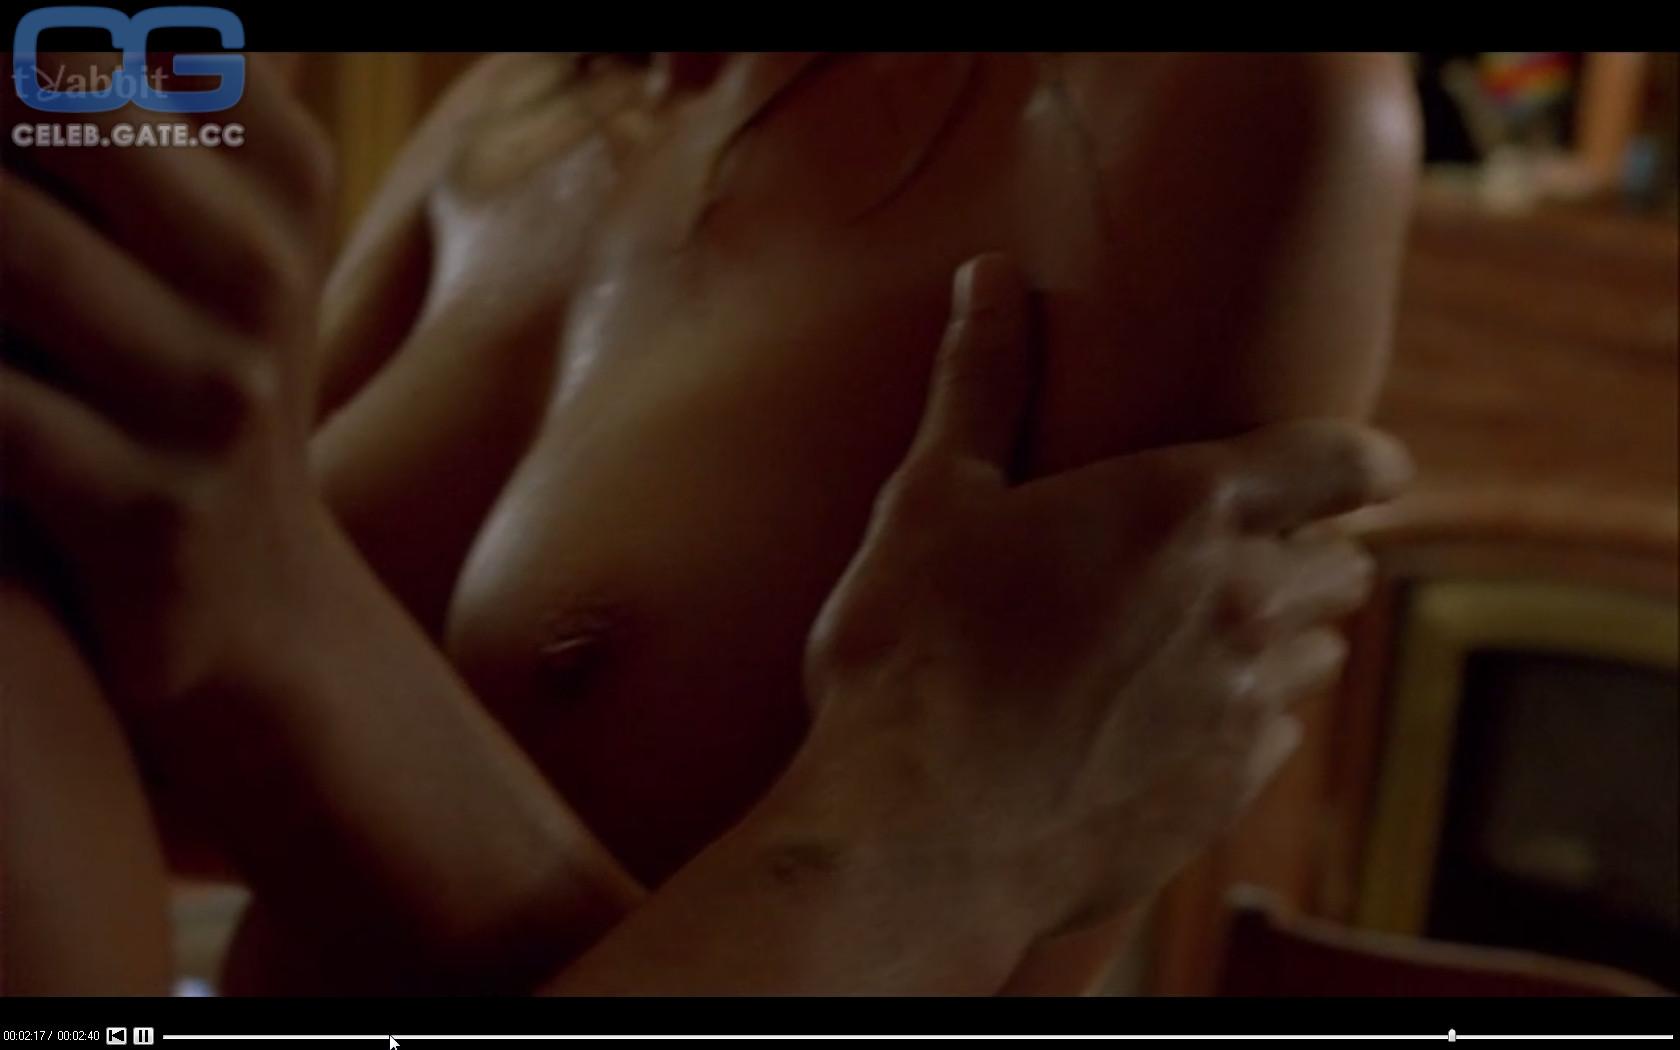 Warm April Bowlby Nude Scene HD